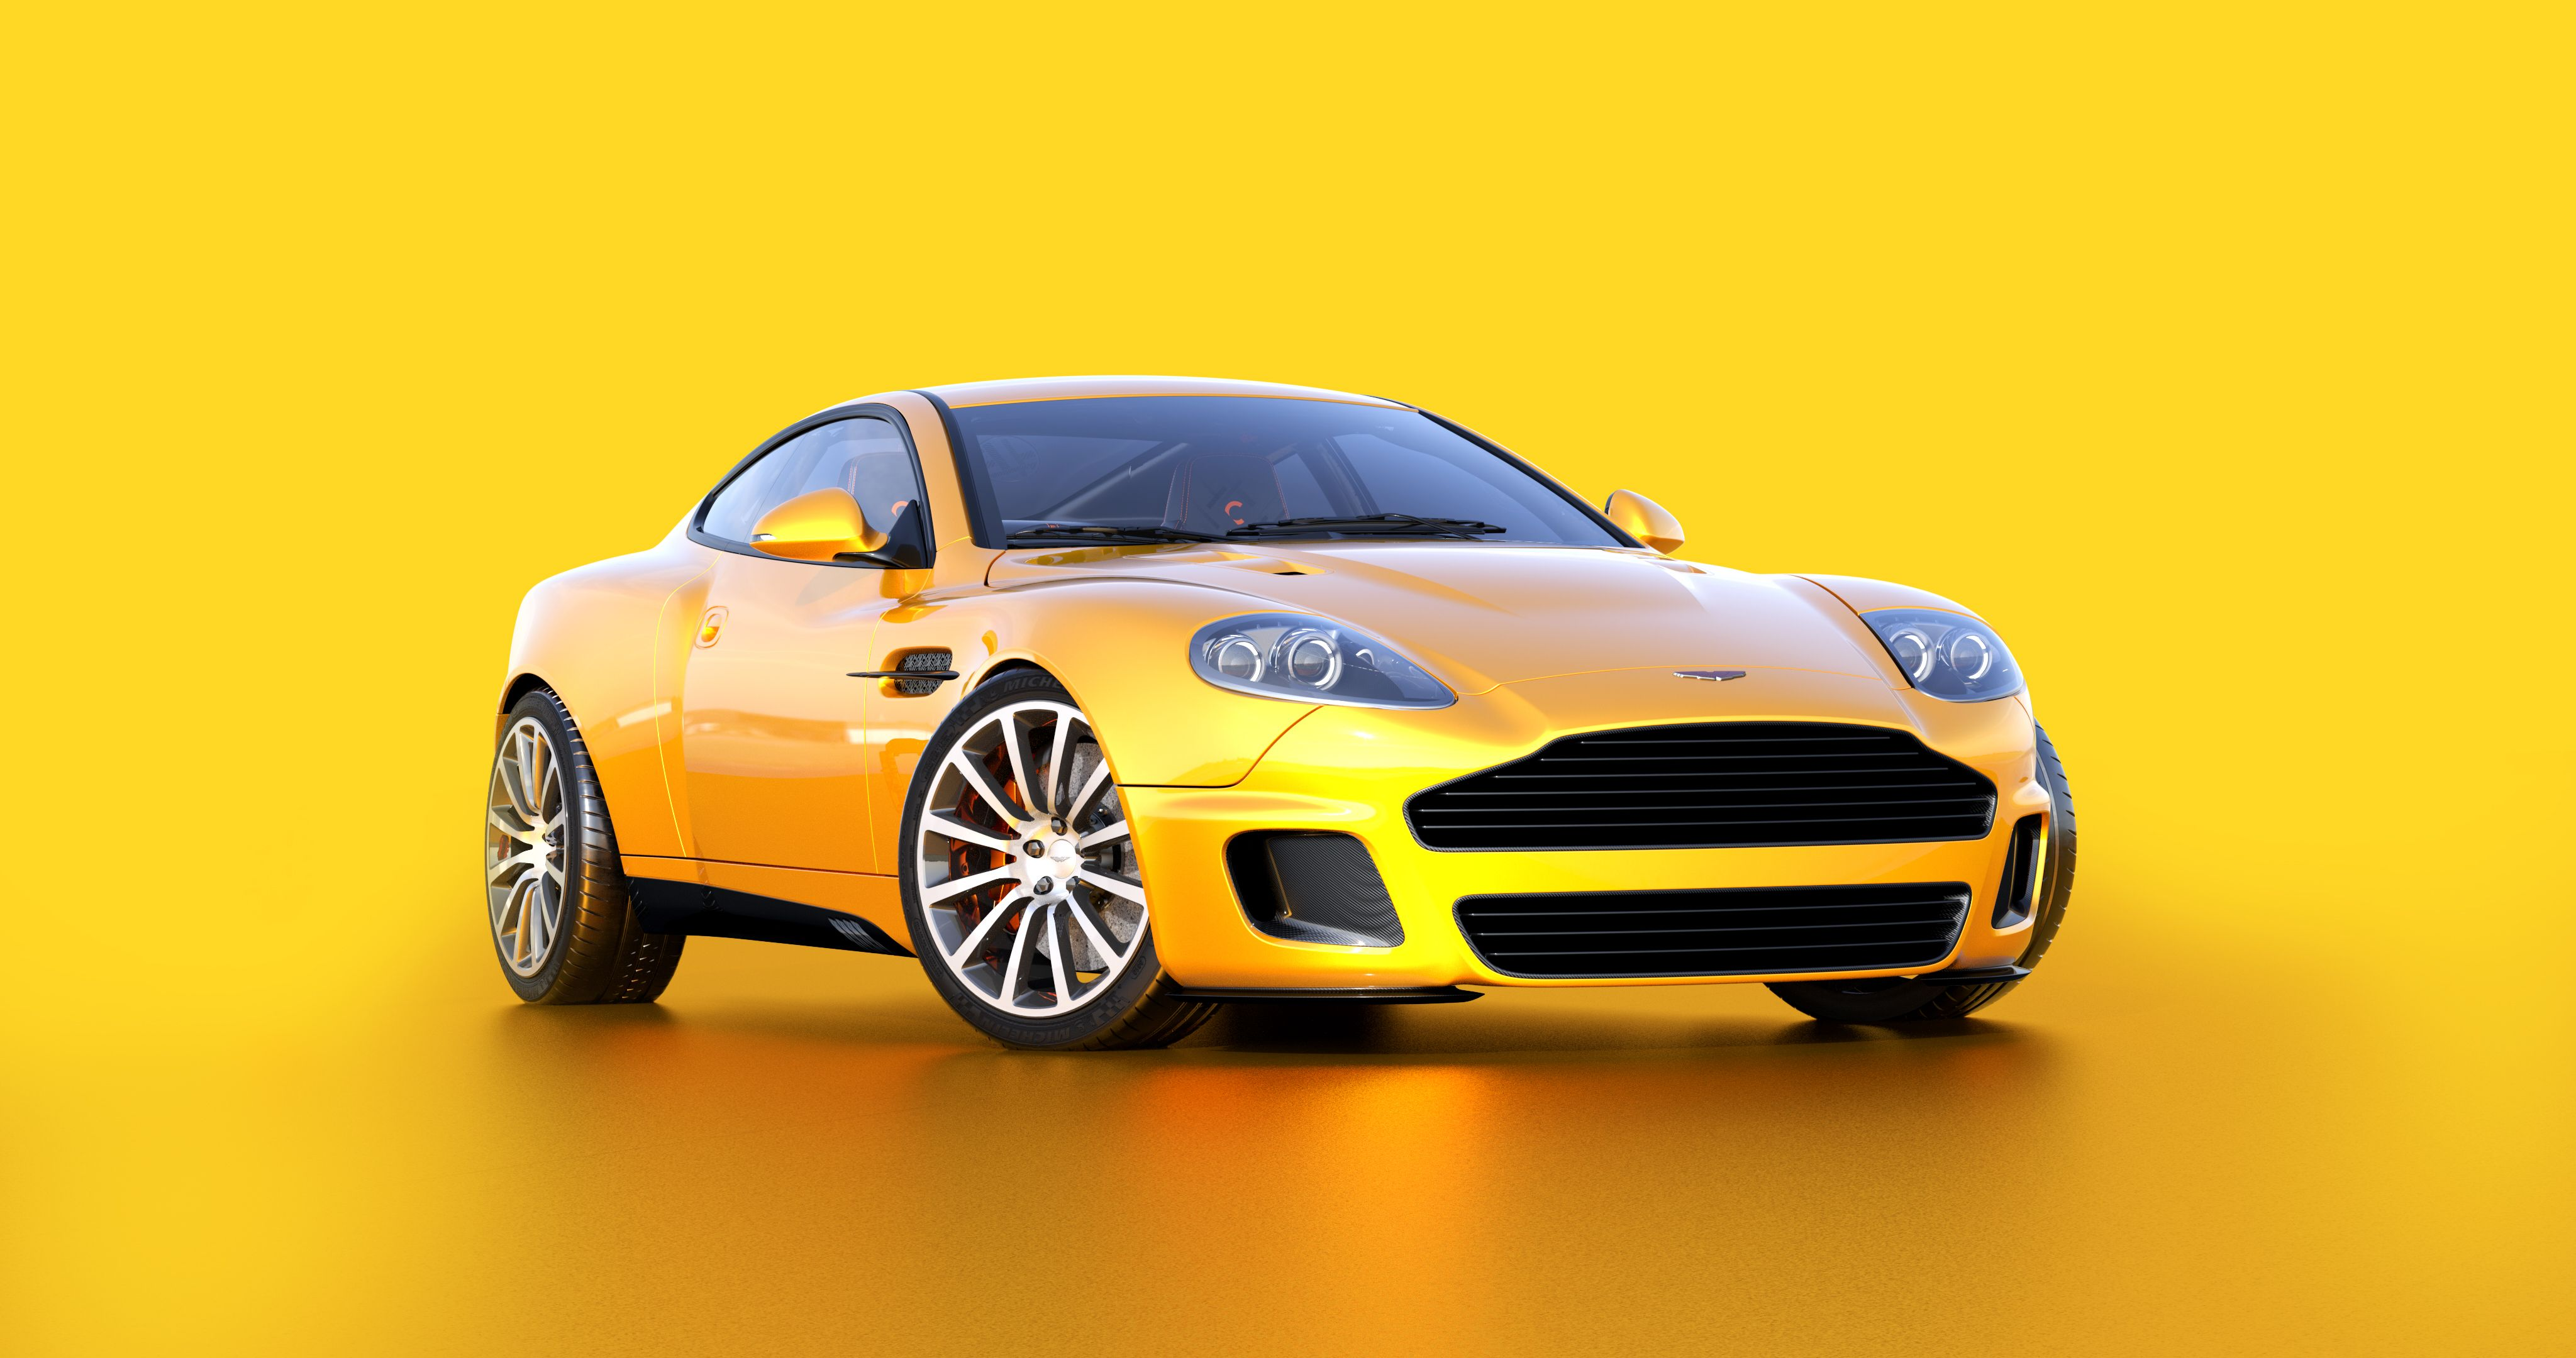 Aston Martin Vanquish Gets Facelifted By Ian Callum